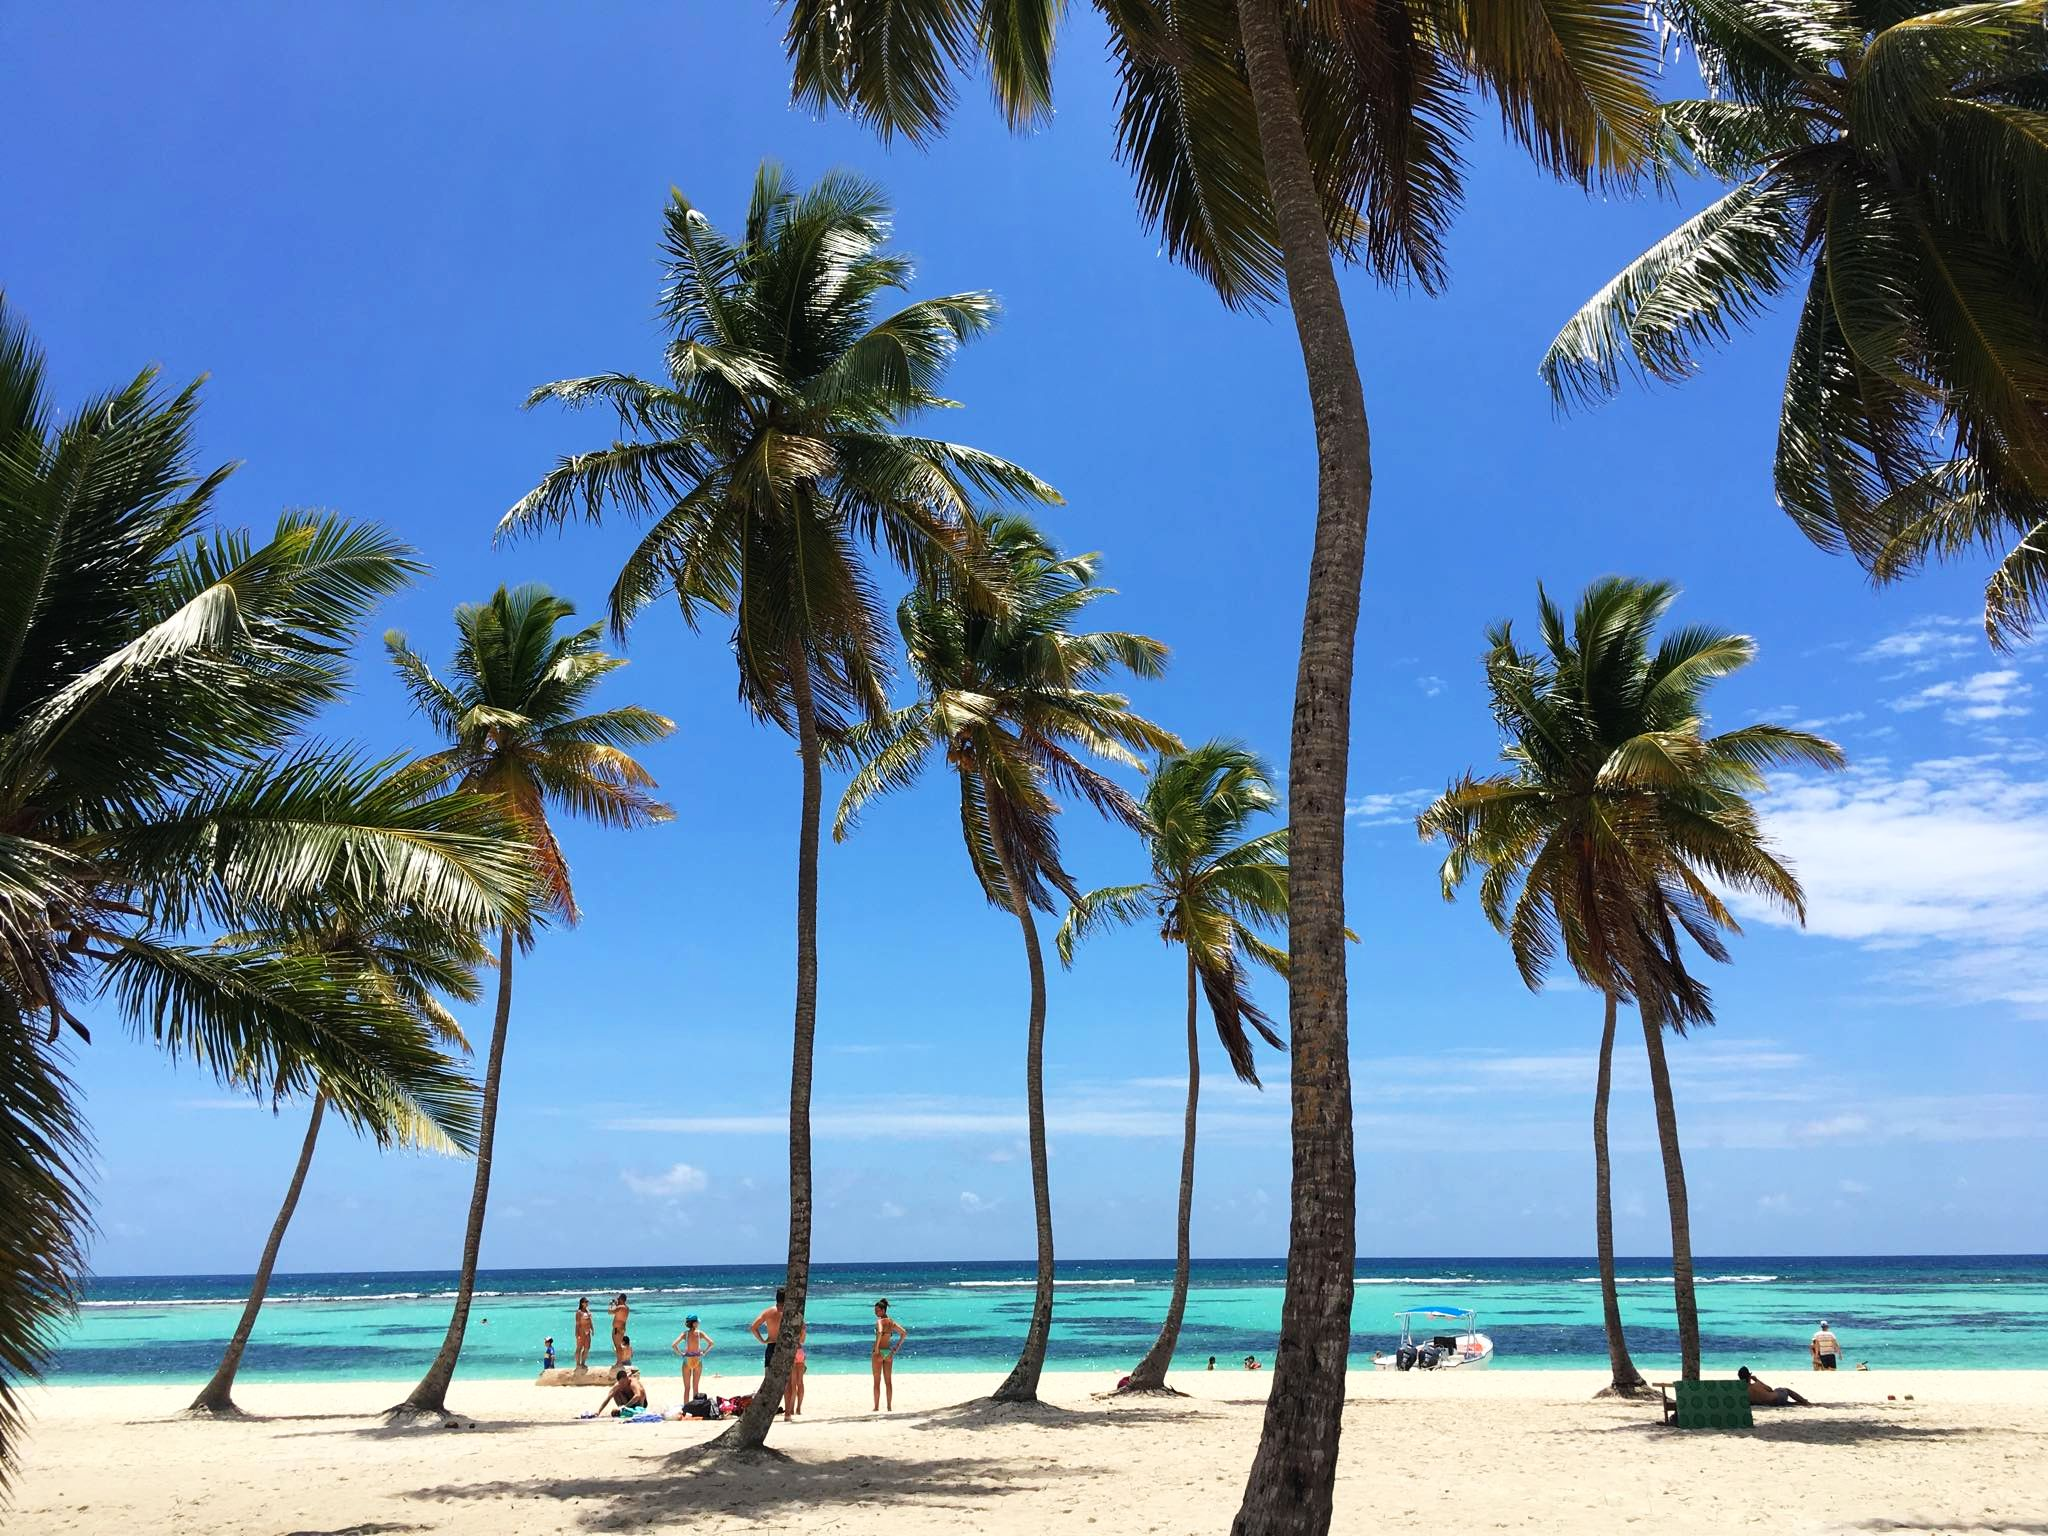 http://idominicana.com/uragan-beril-v-dominikane-video/